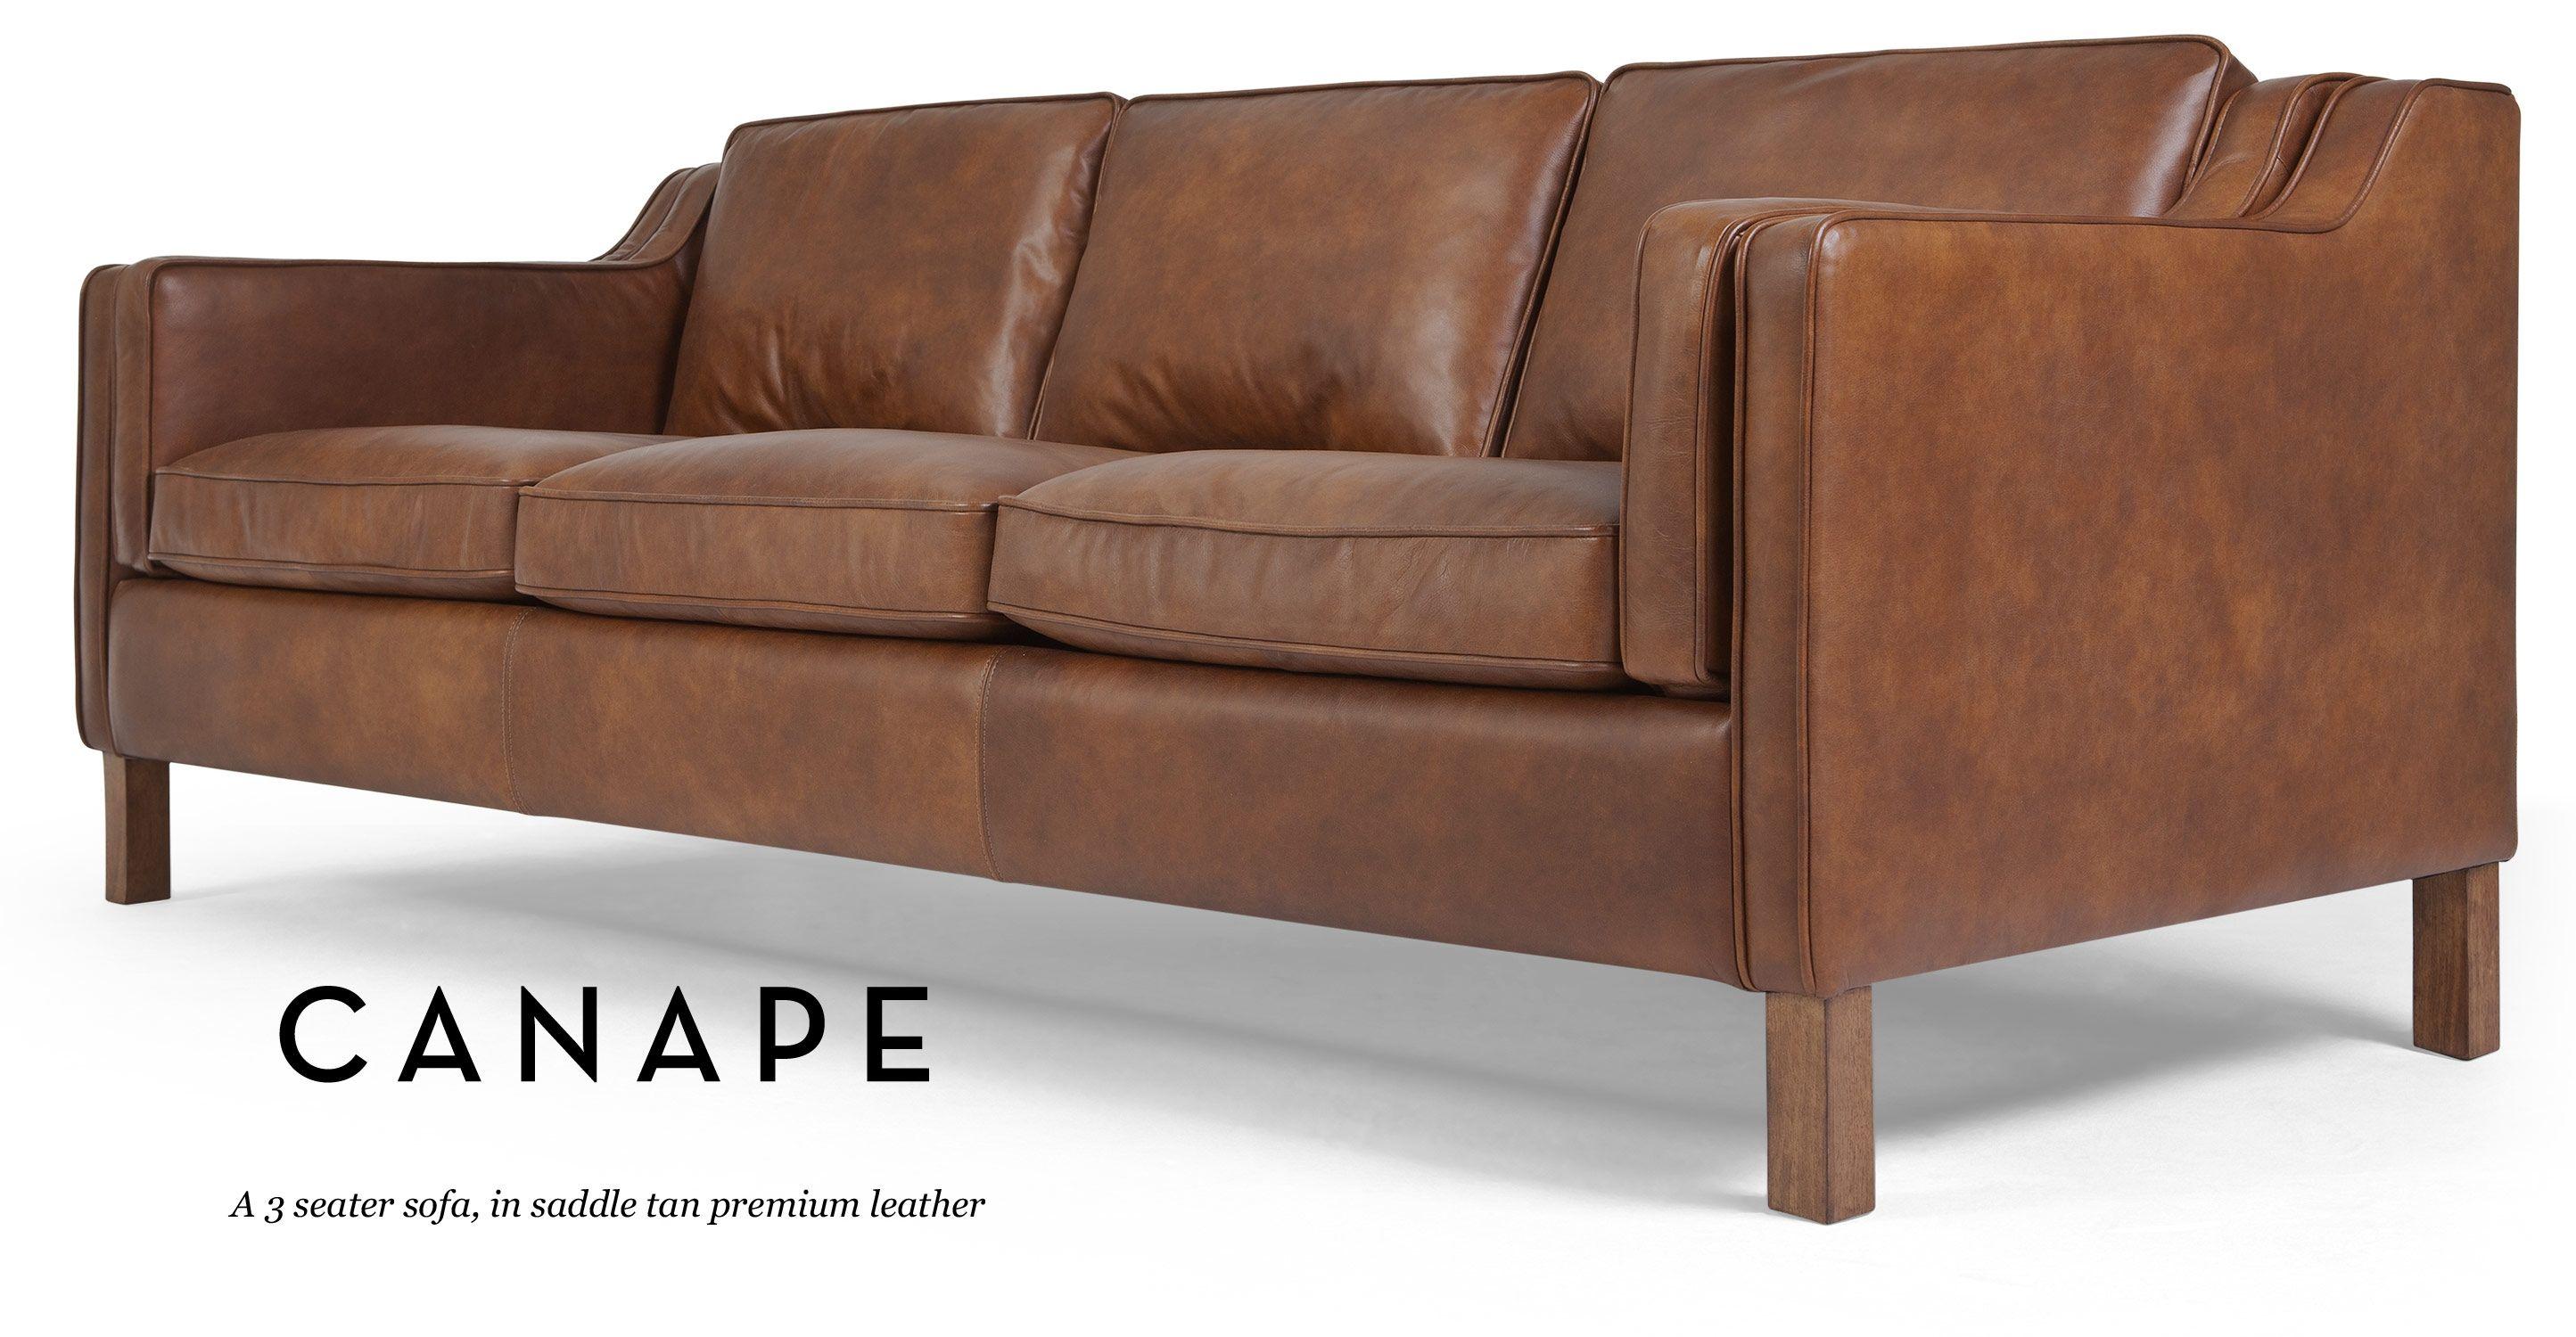 Pin by Amanda B on Interior Design - Furniture | Tan ...